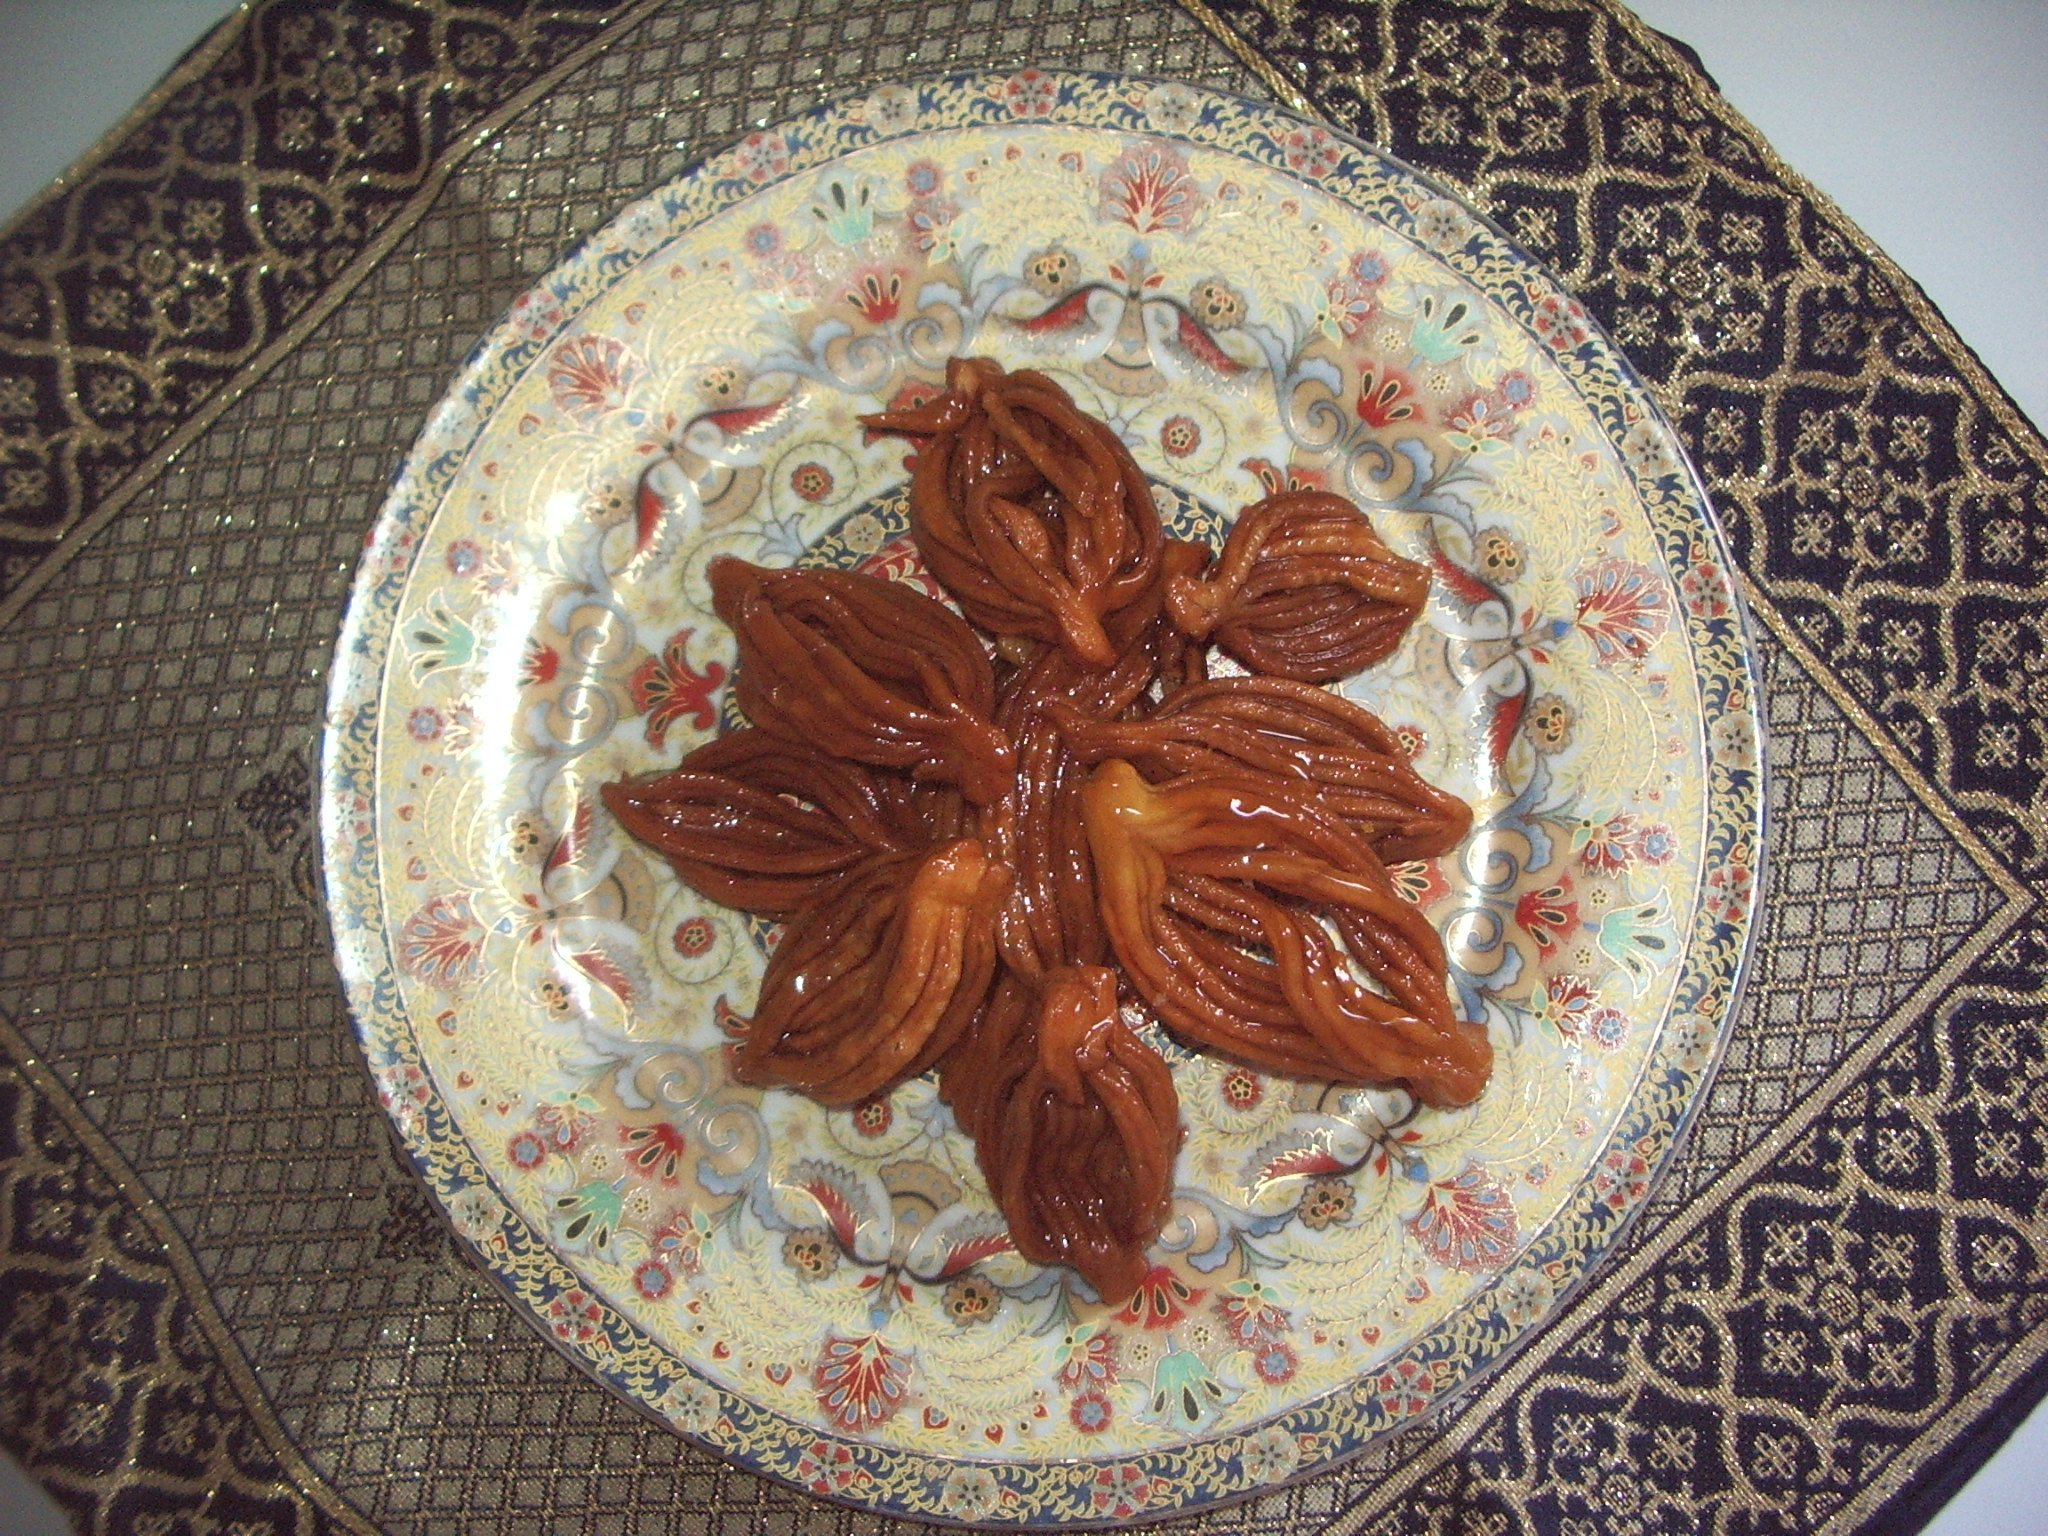 tire de la recette de choumicha une presentatrice de cuisine au maroc